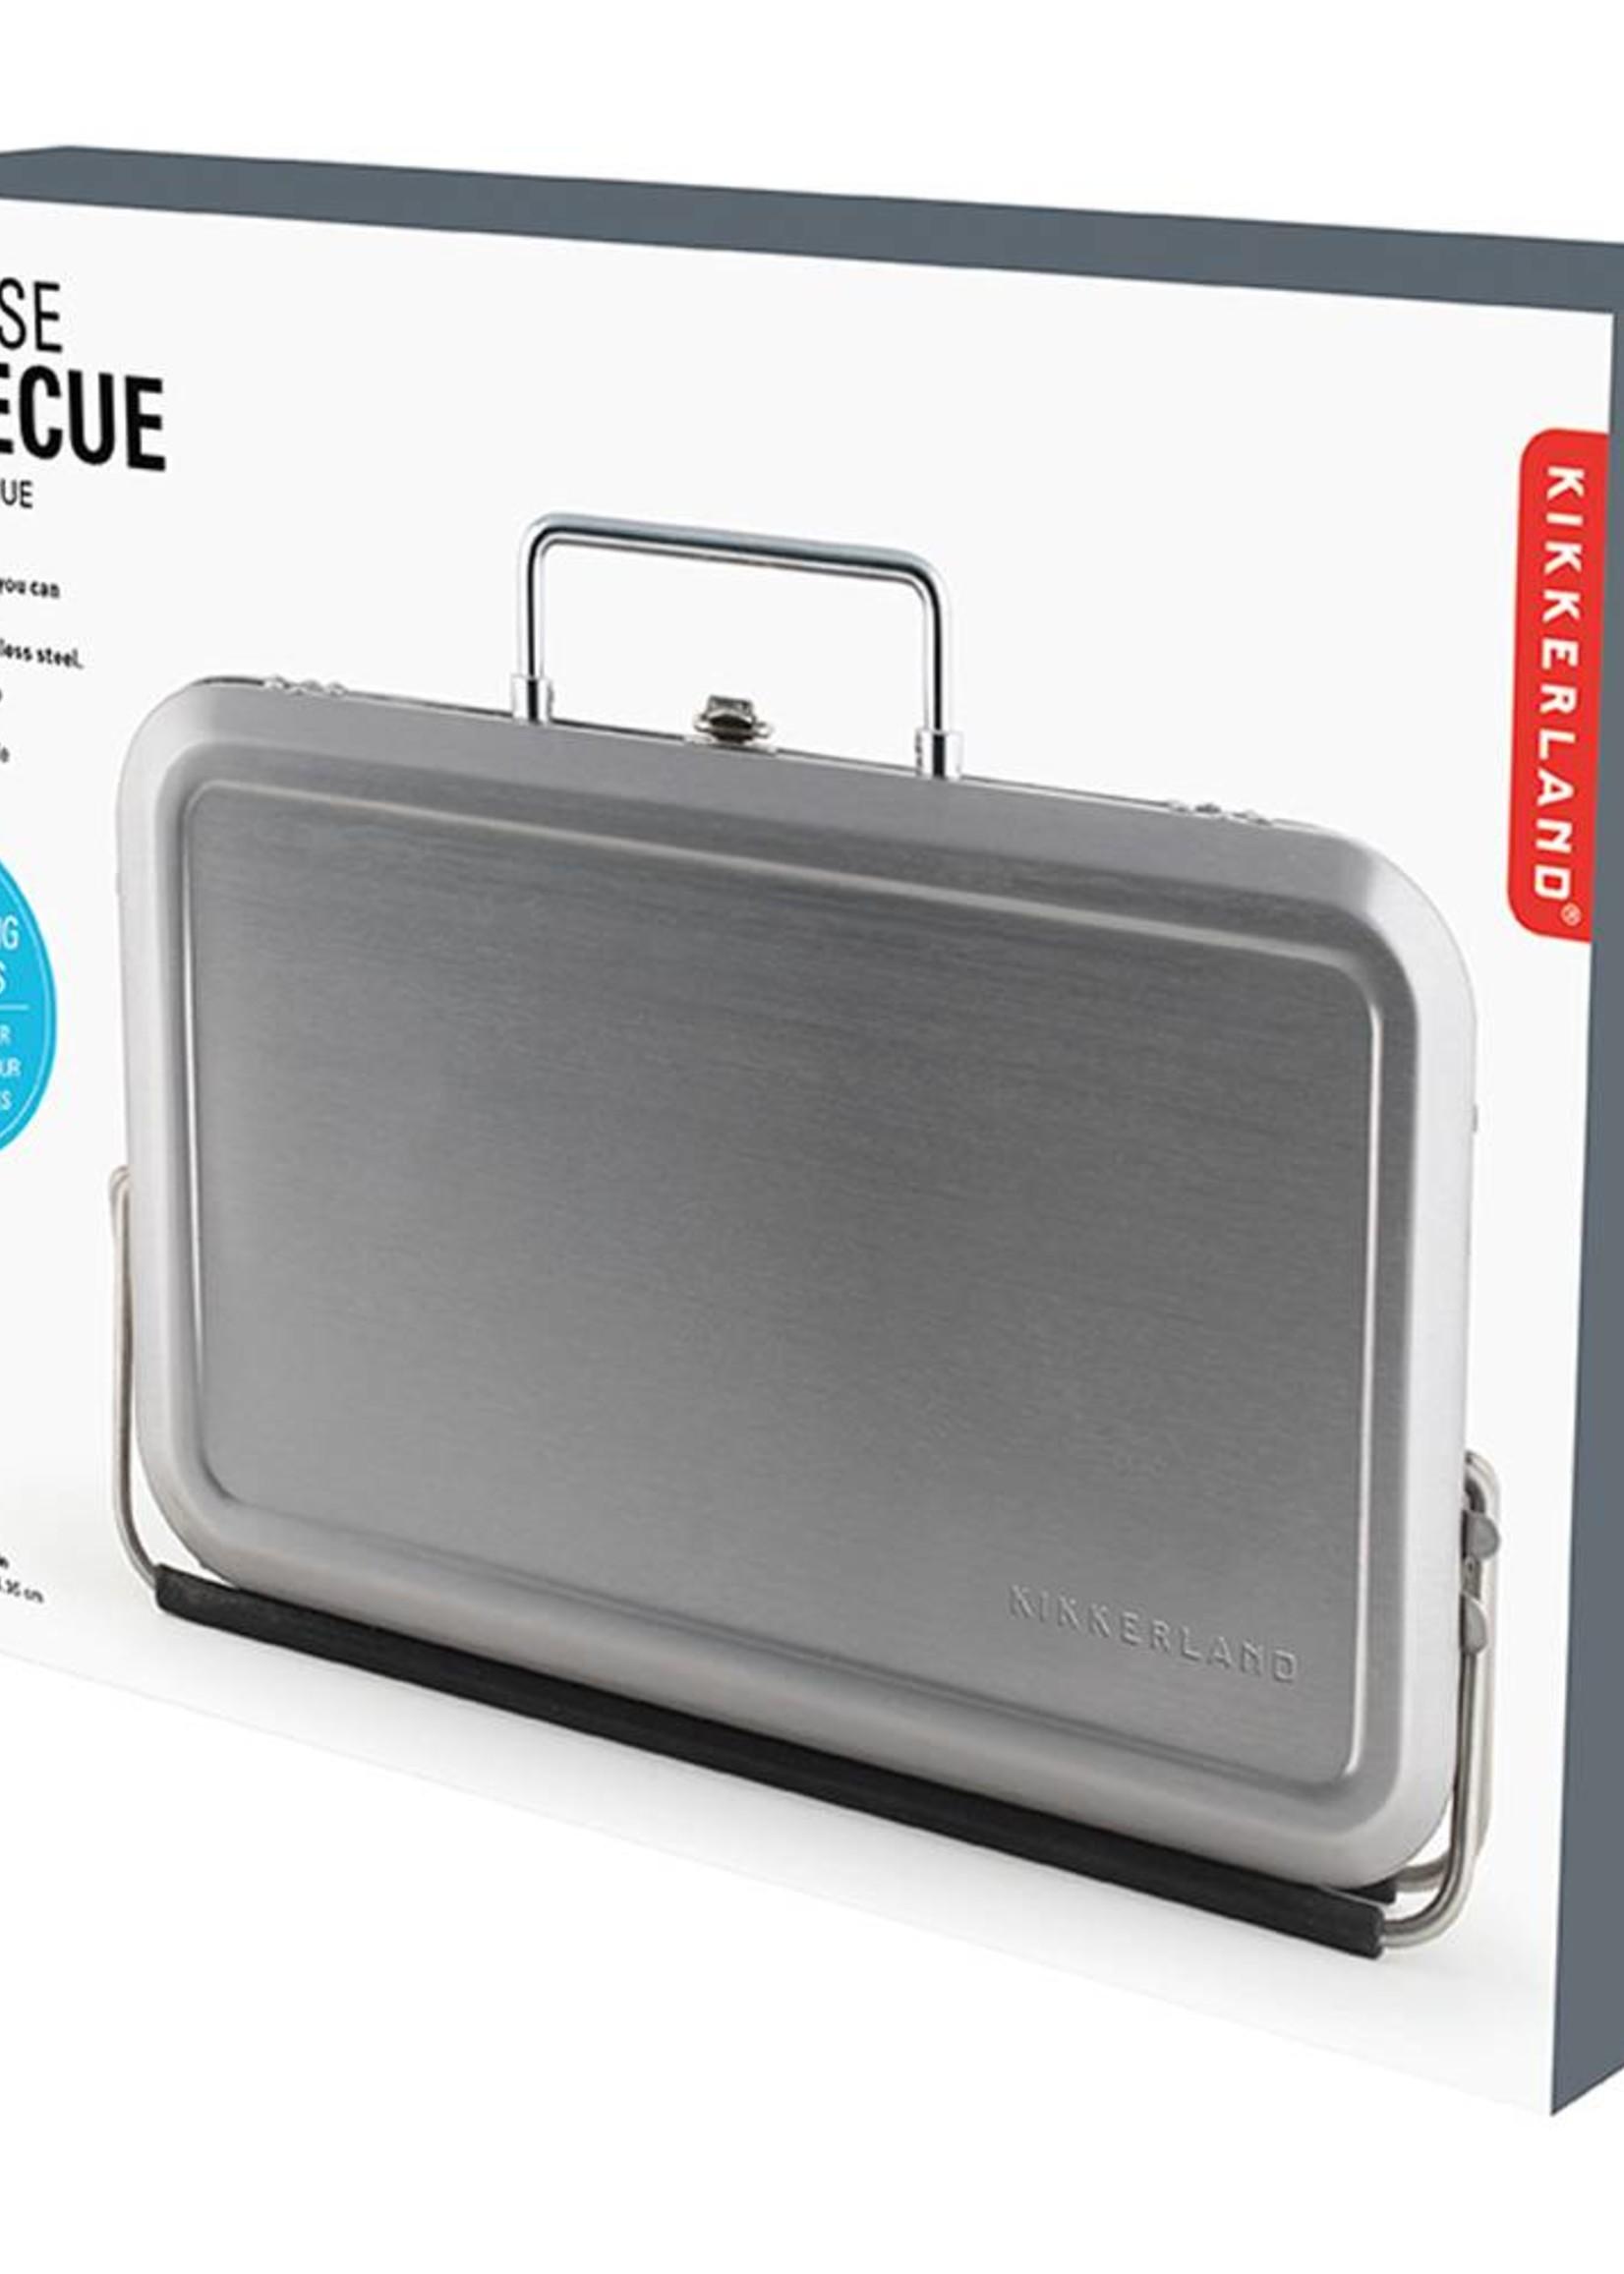 Kikkerland Portable BBQ Suitcase